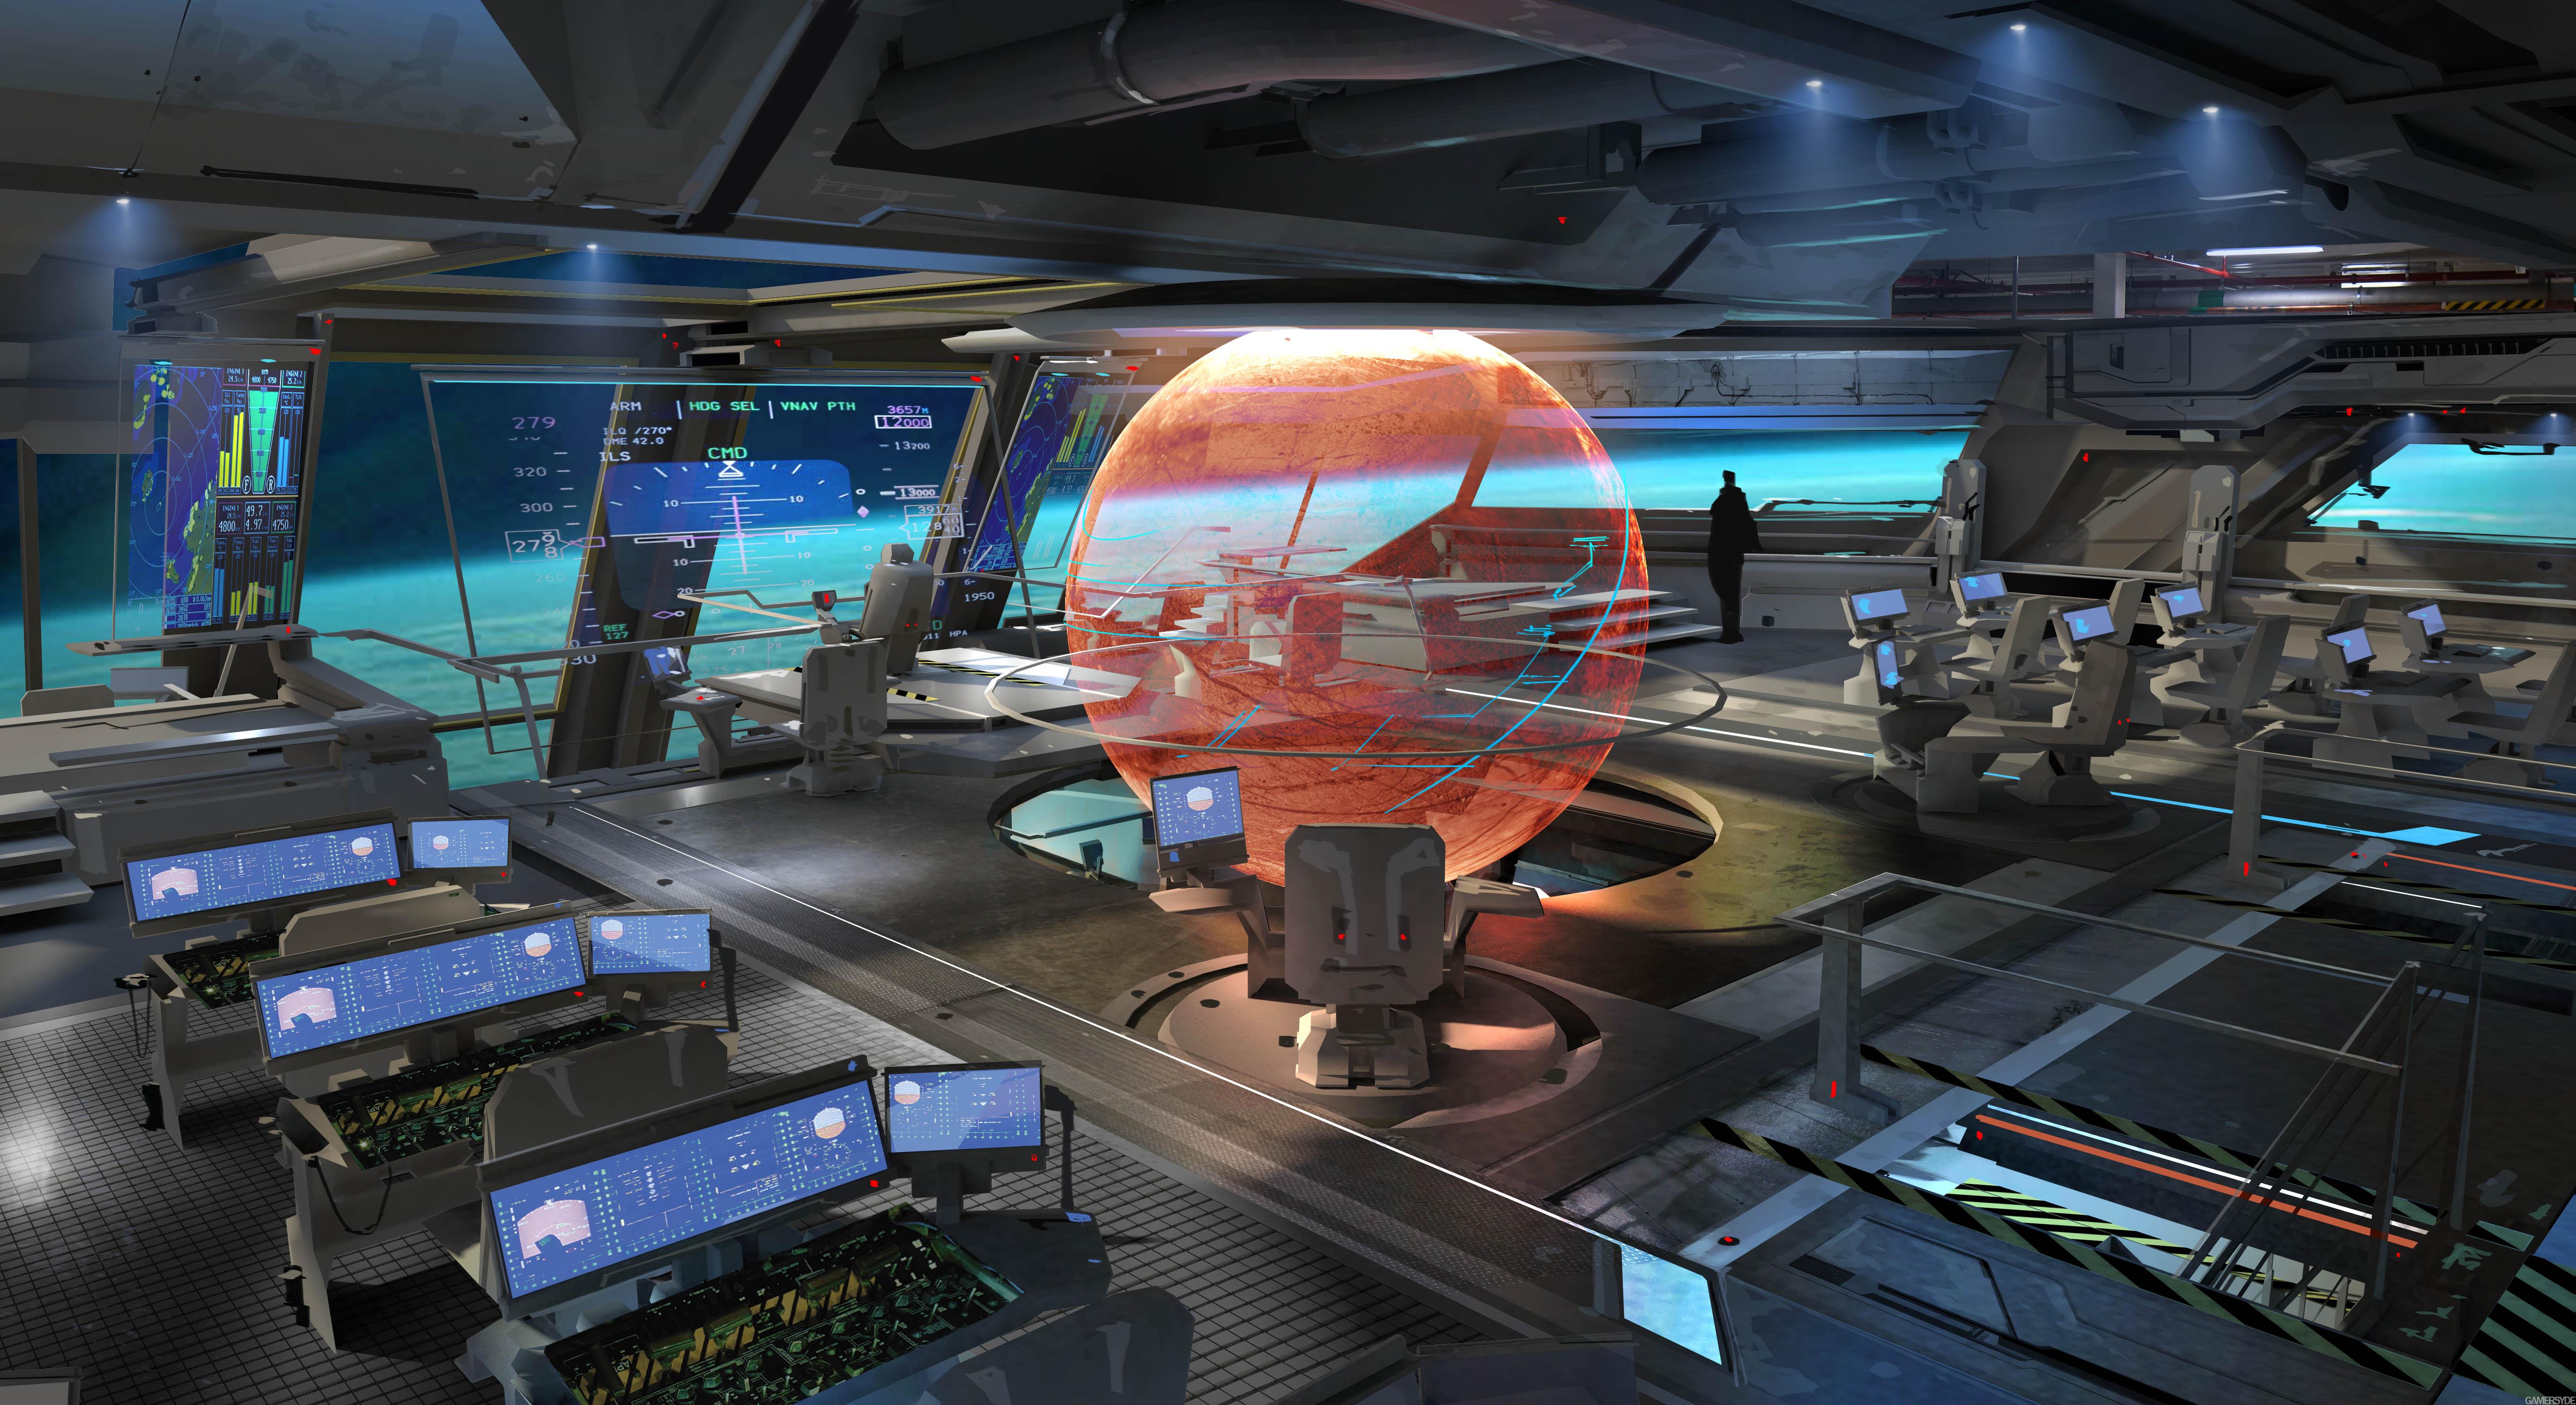 Spaceship Interior Background Viewing Gallery